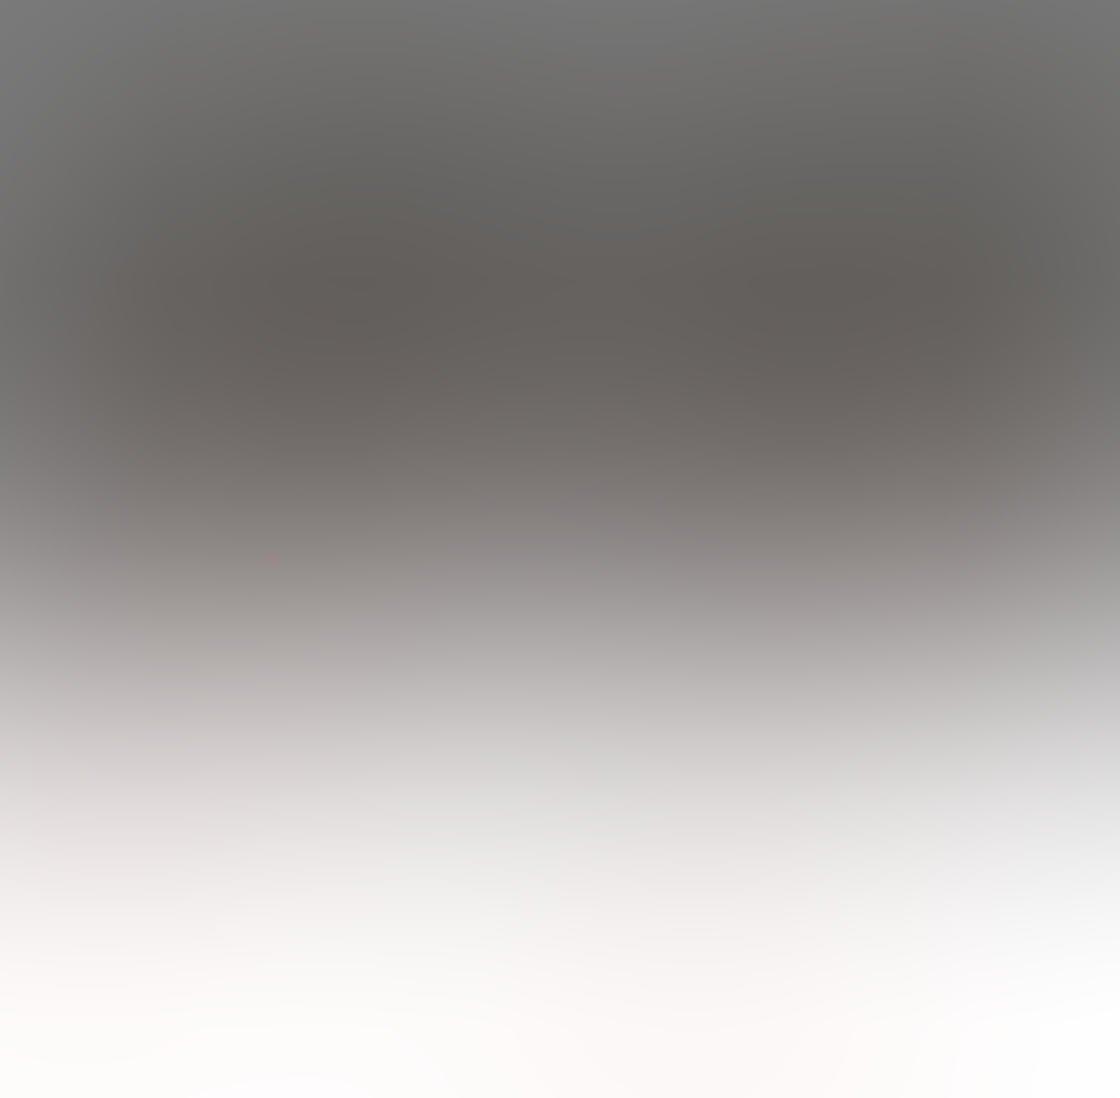 Vsco filters 12